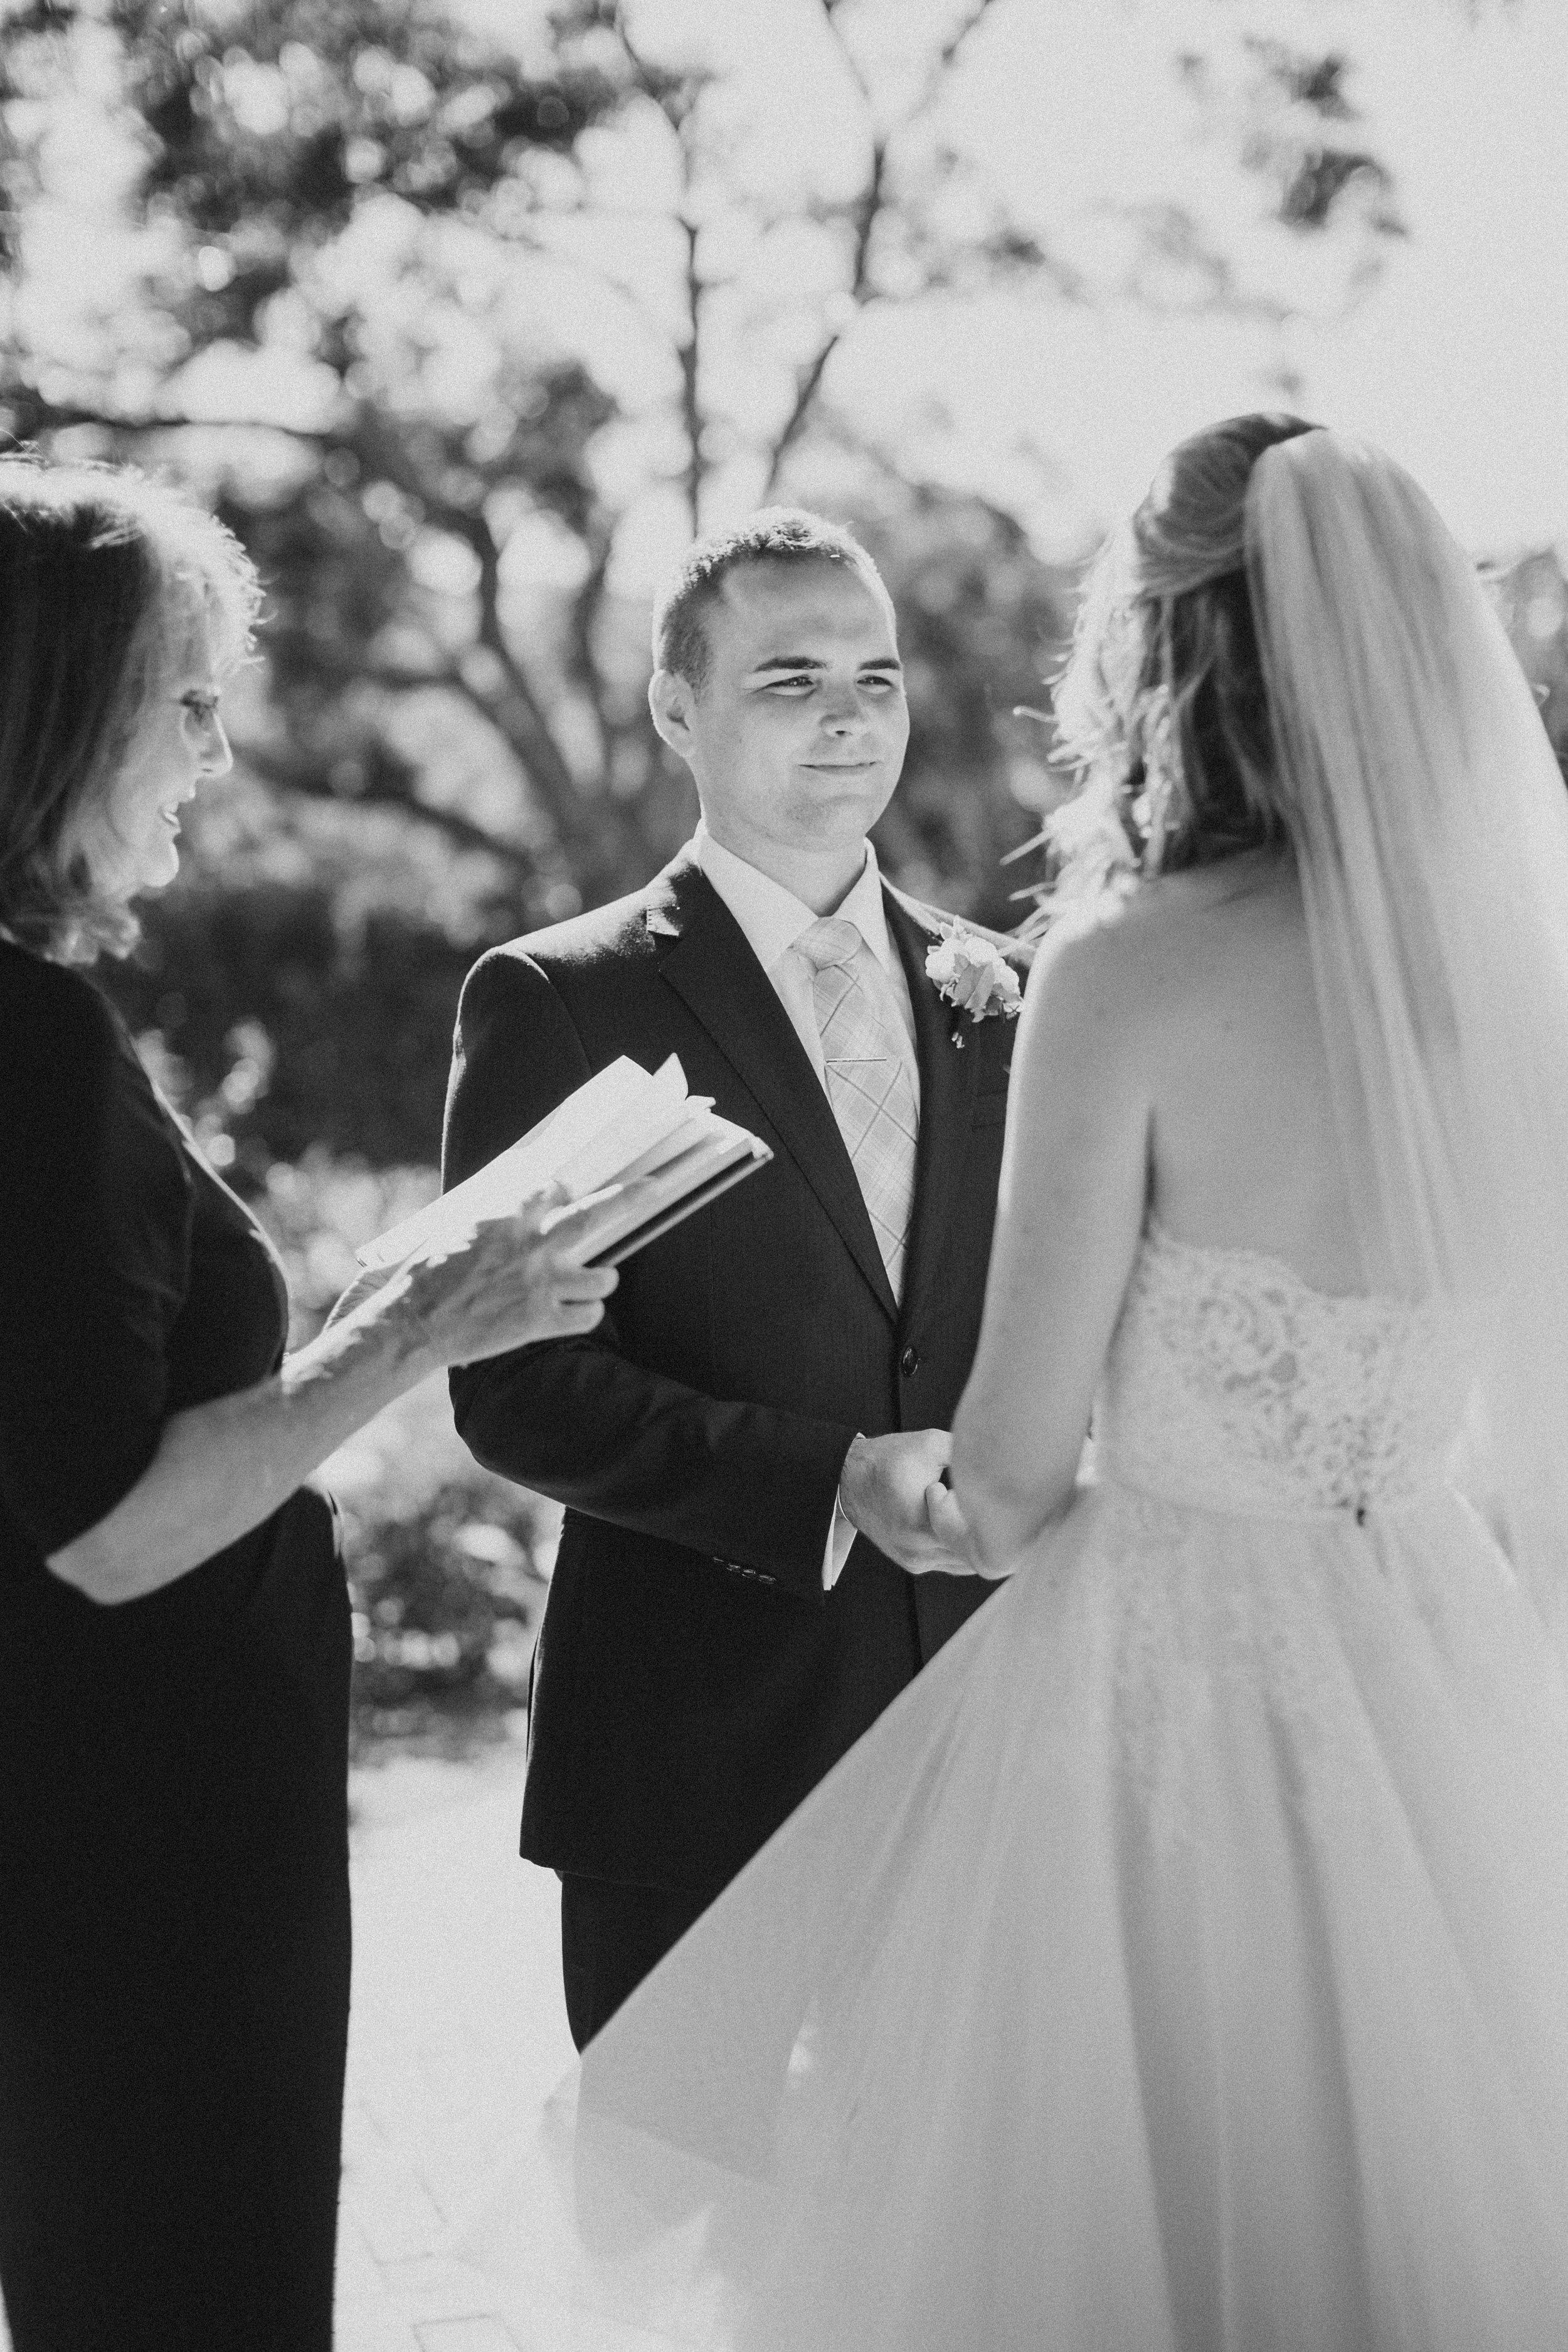 www.santabarbarawedding.com | Ryanne Bee Photography | The Santa Barbara Club | Santa Barbara Classic Weddings | Bride and Groom at the Ceremony